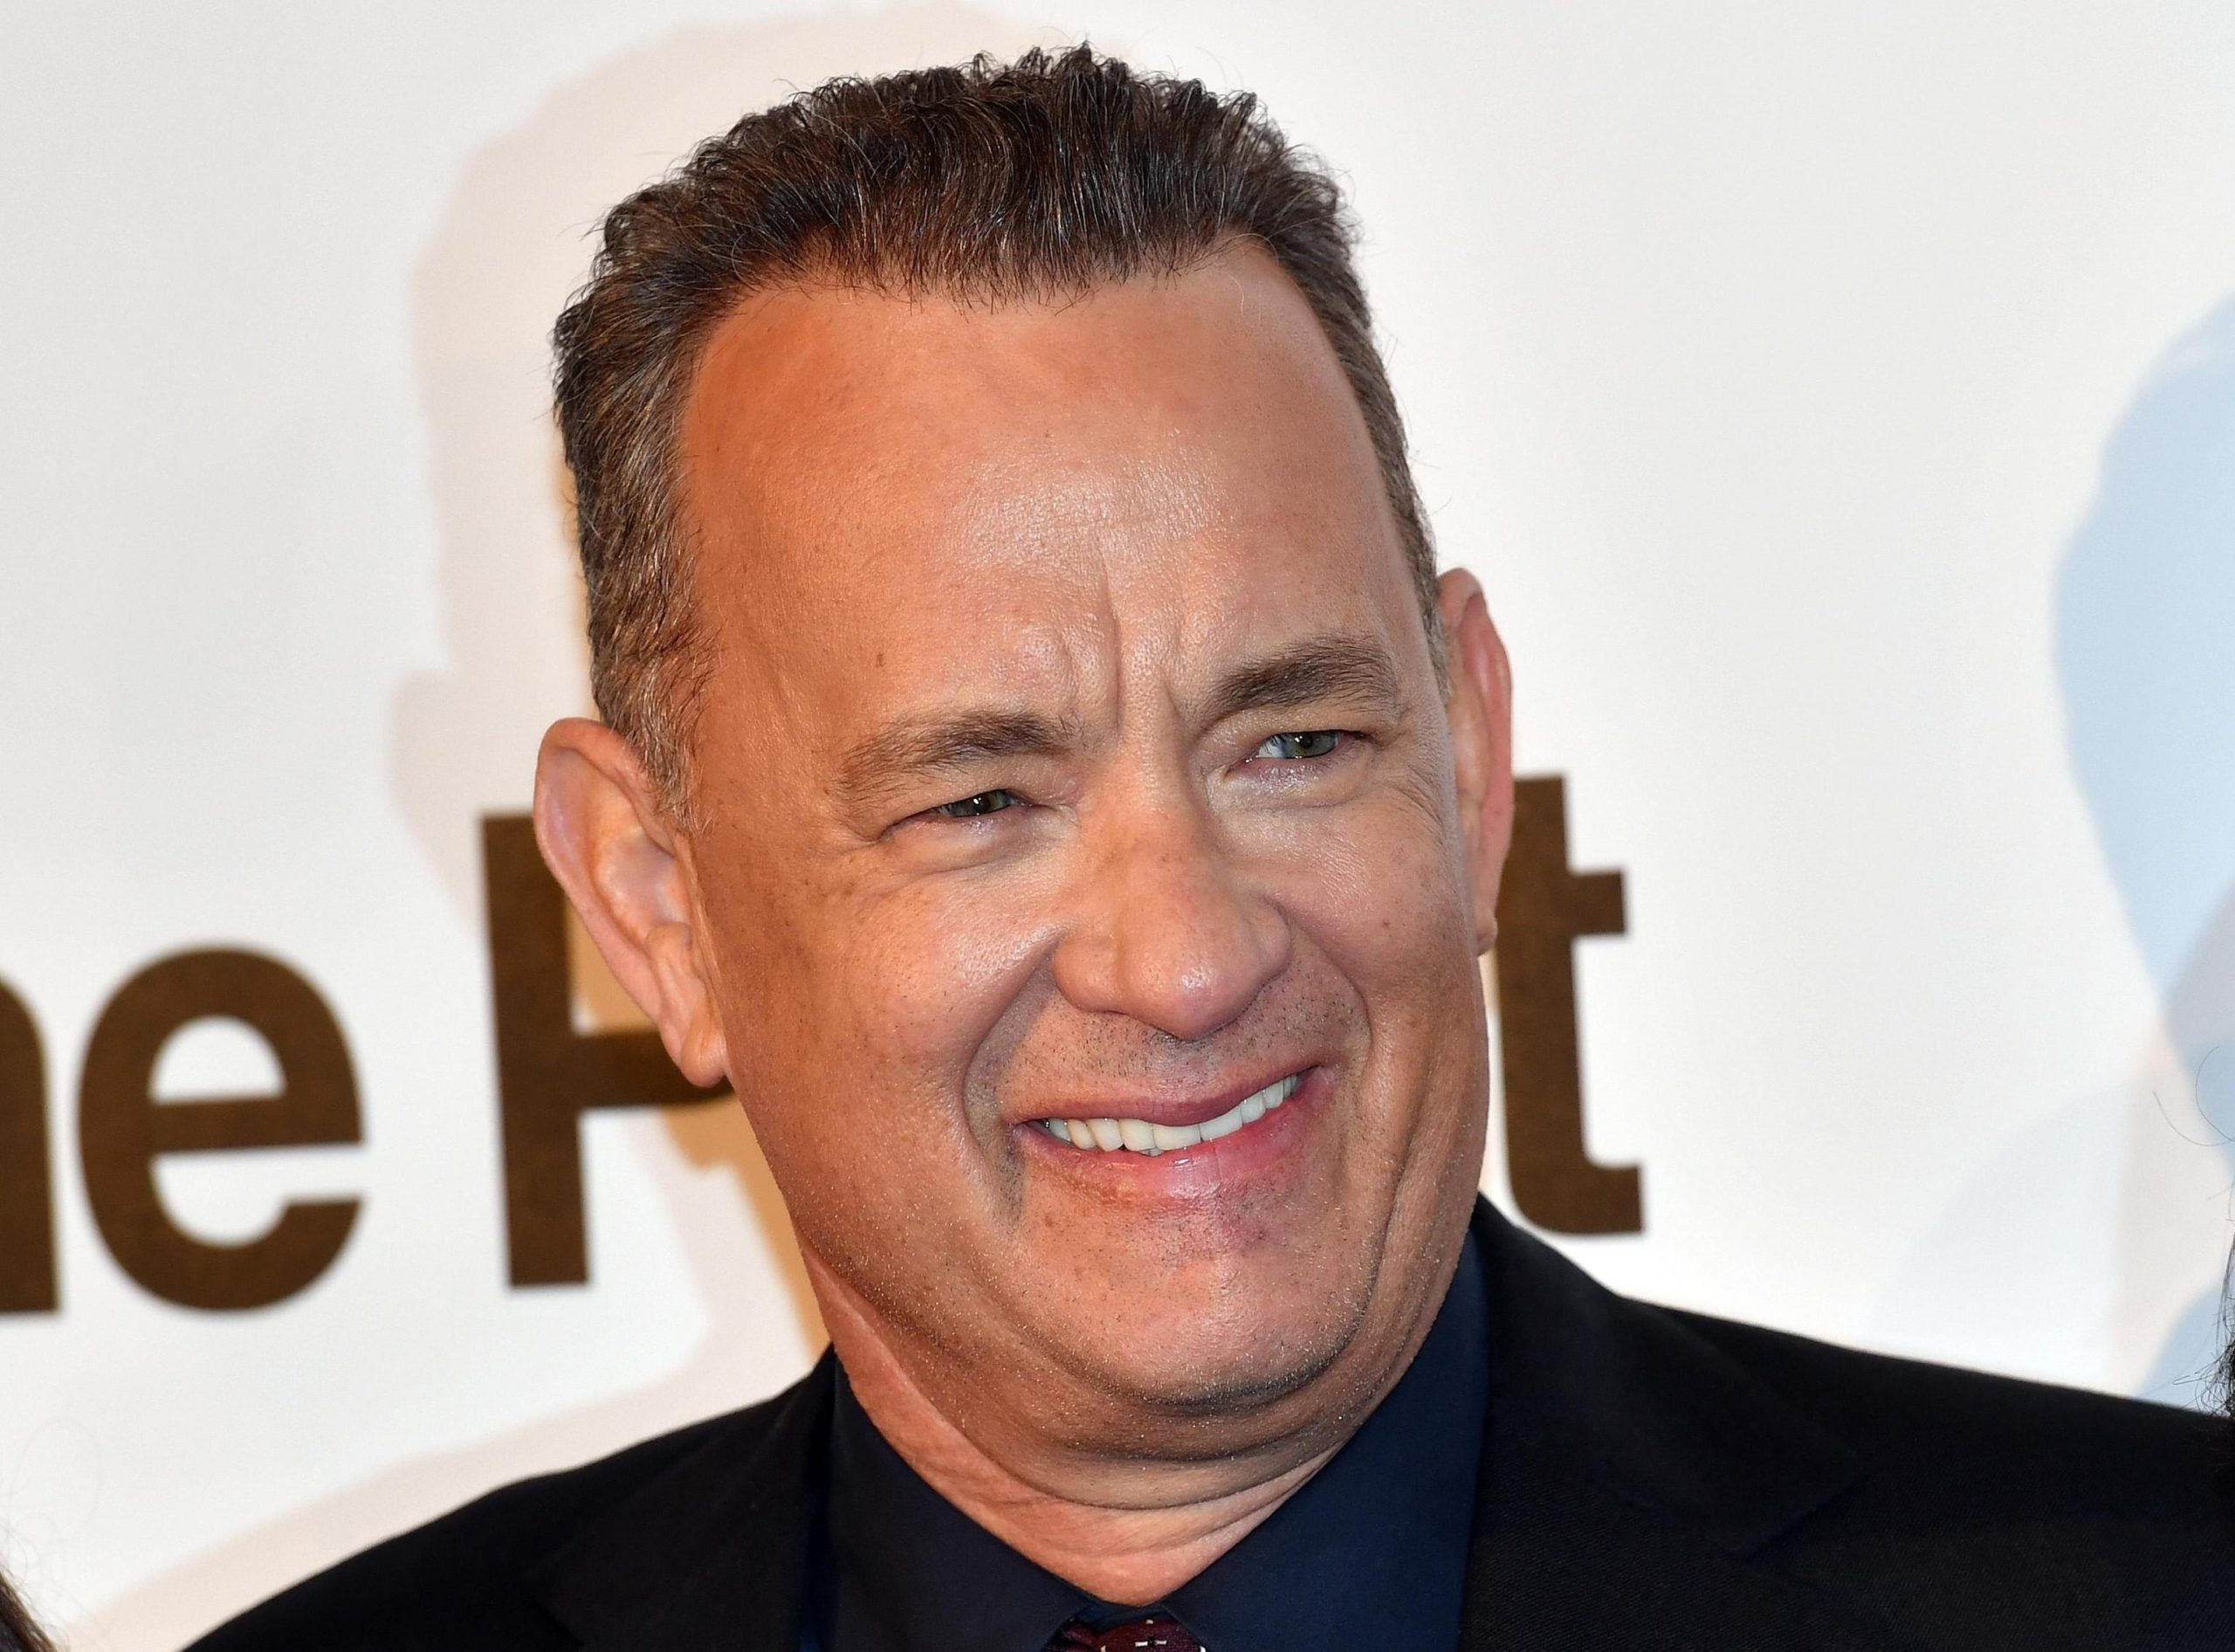 1625365388 959 Tom Hanks a true Hollywood star MVS News